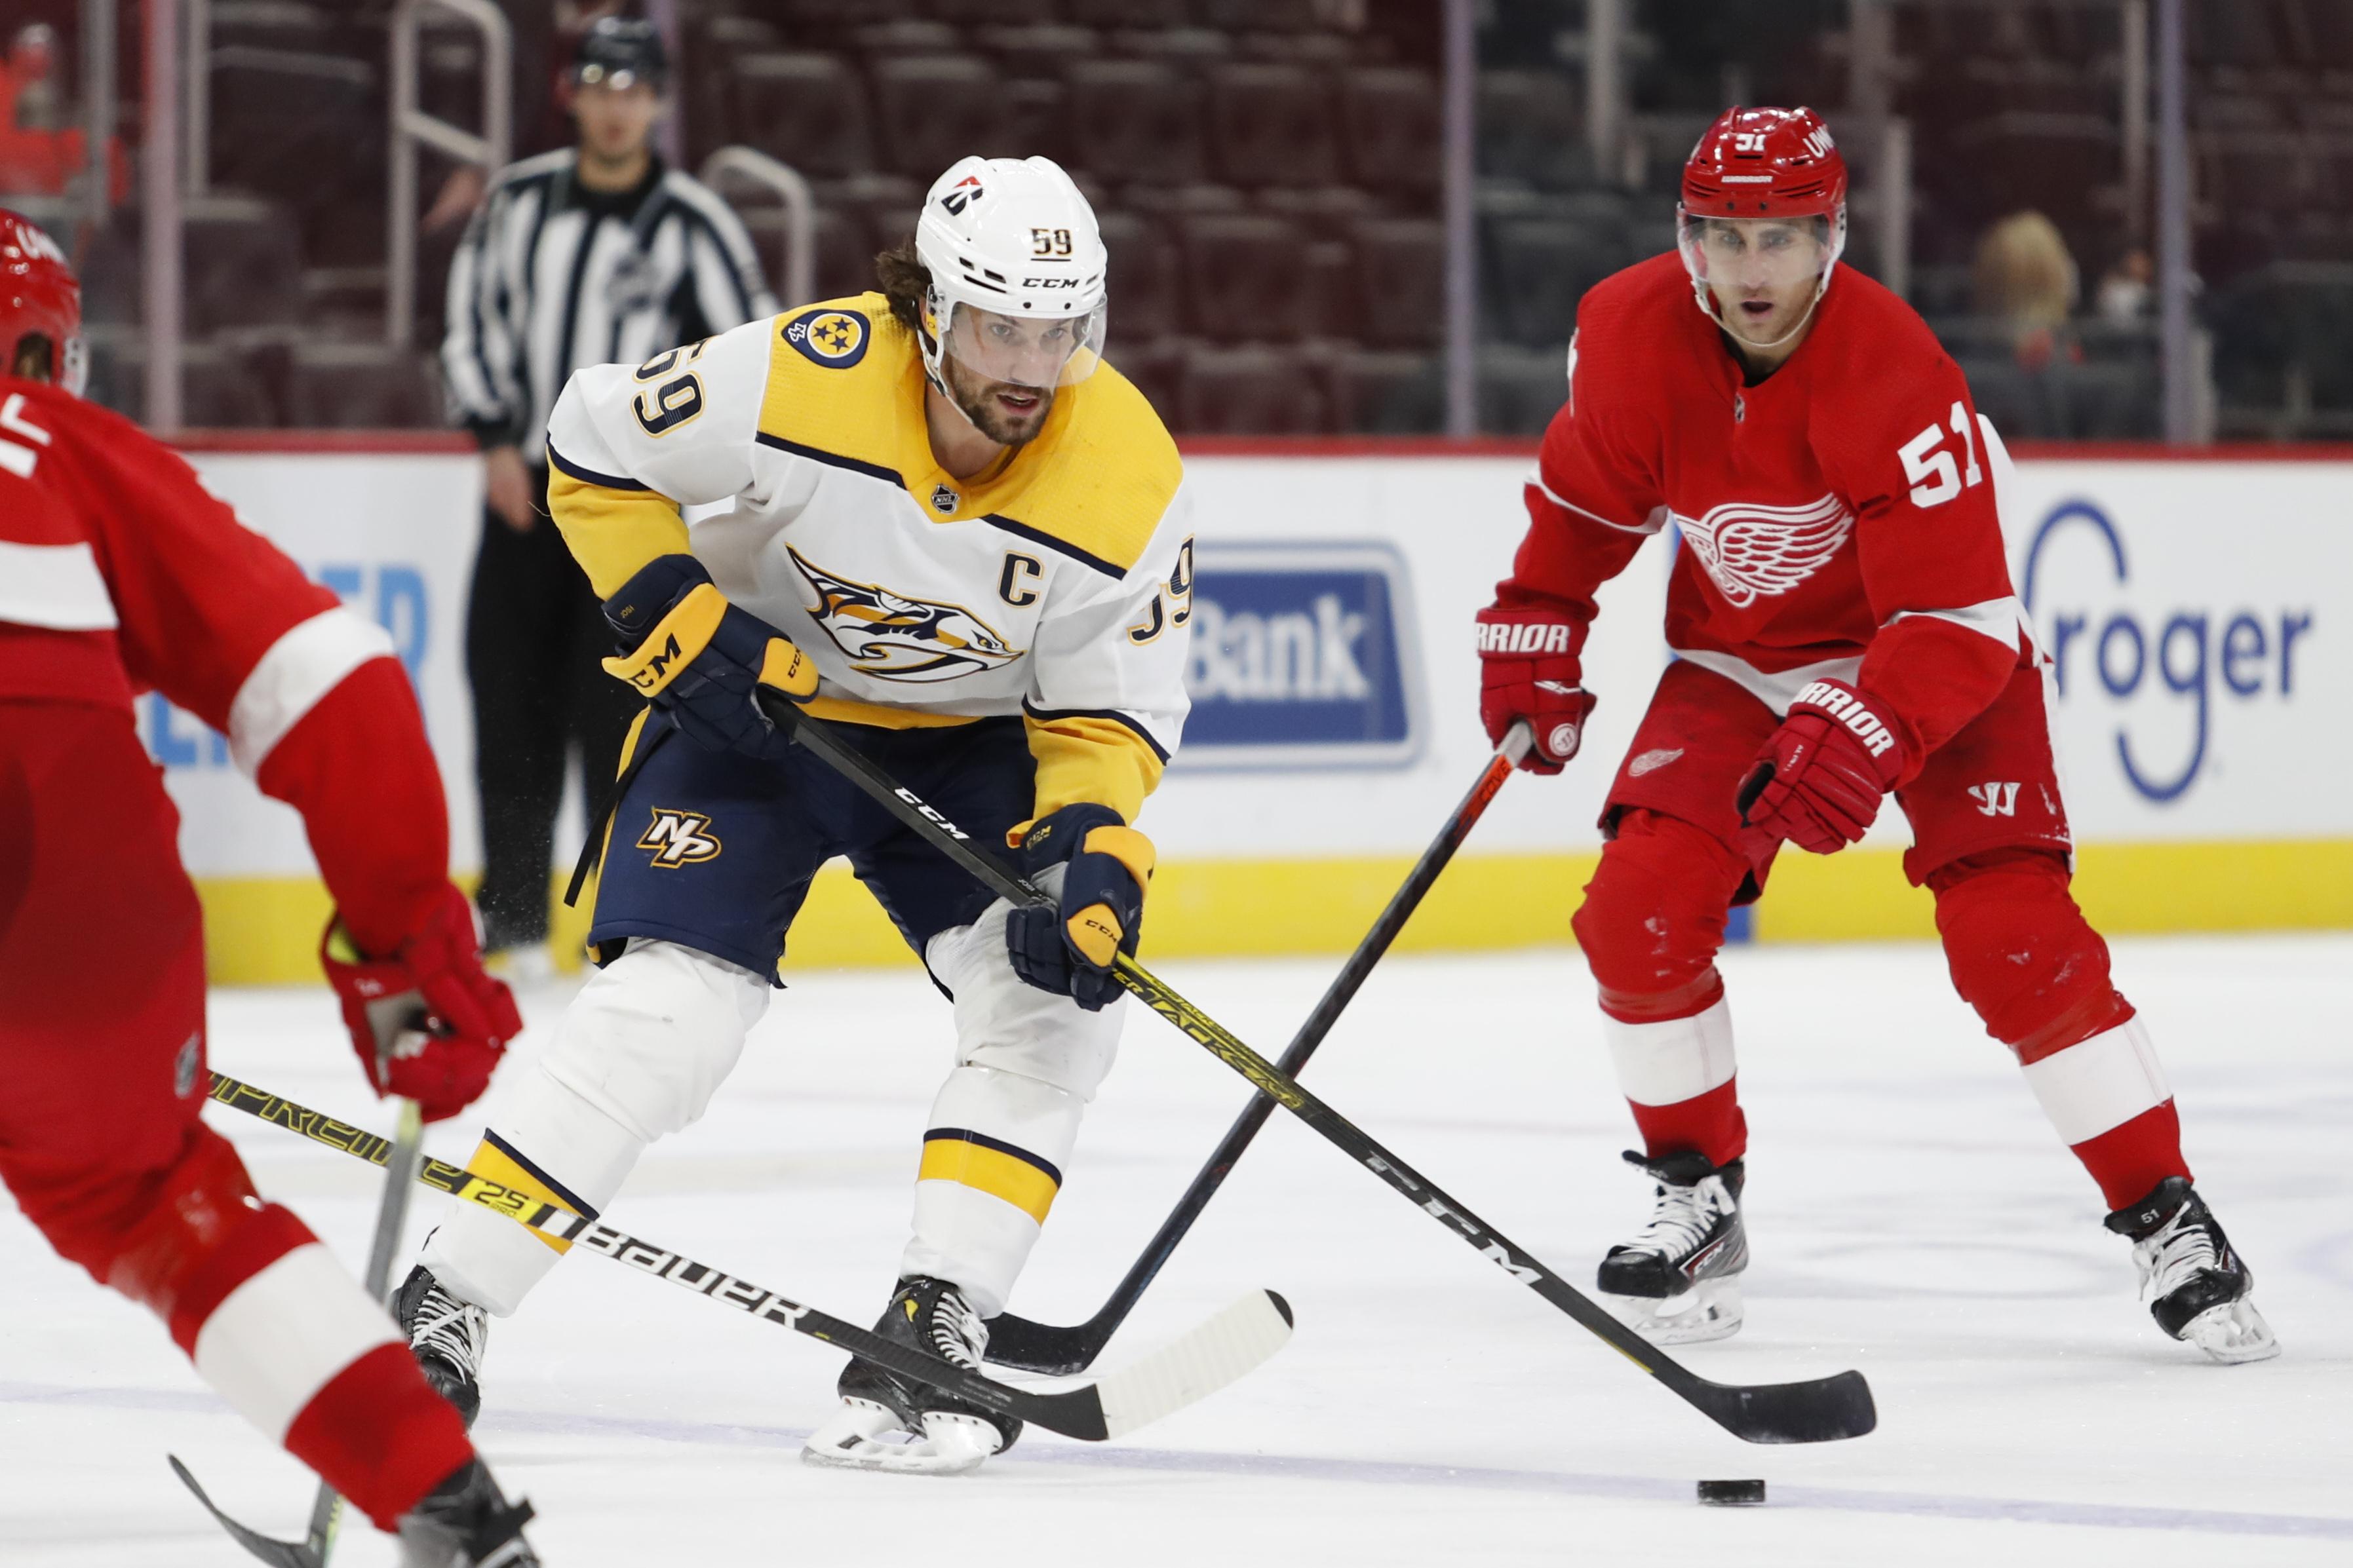 NHL: Nashville Predators at Detroit Red Wings